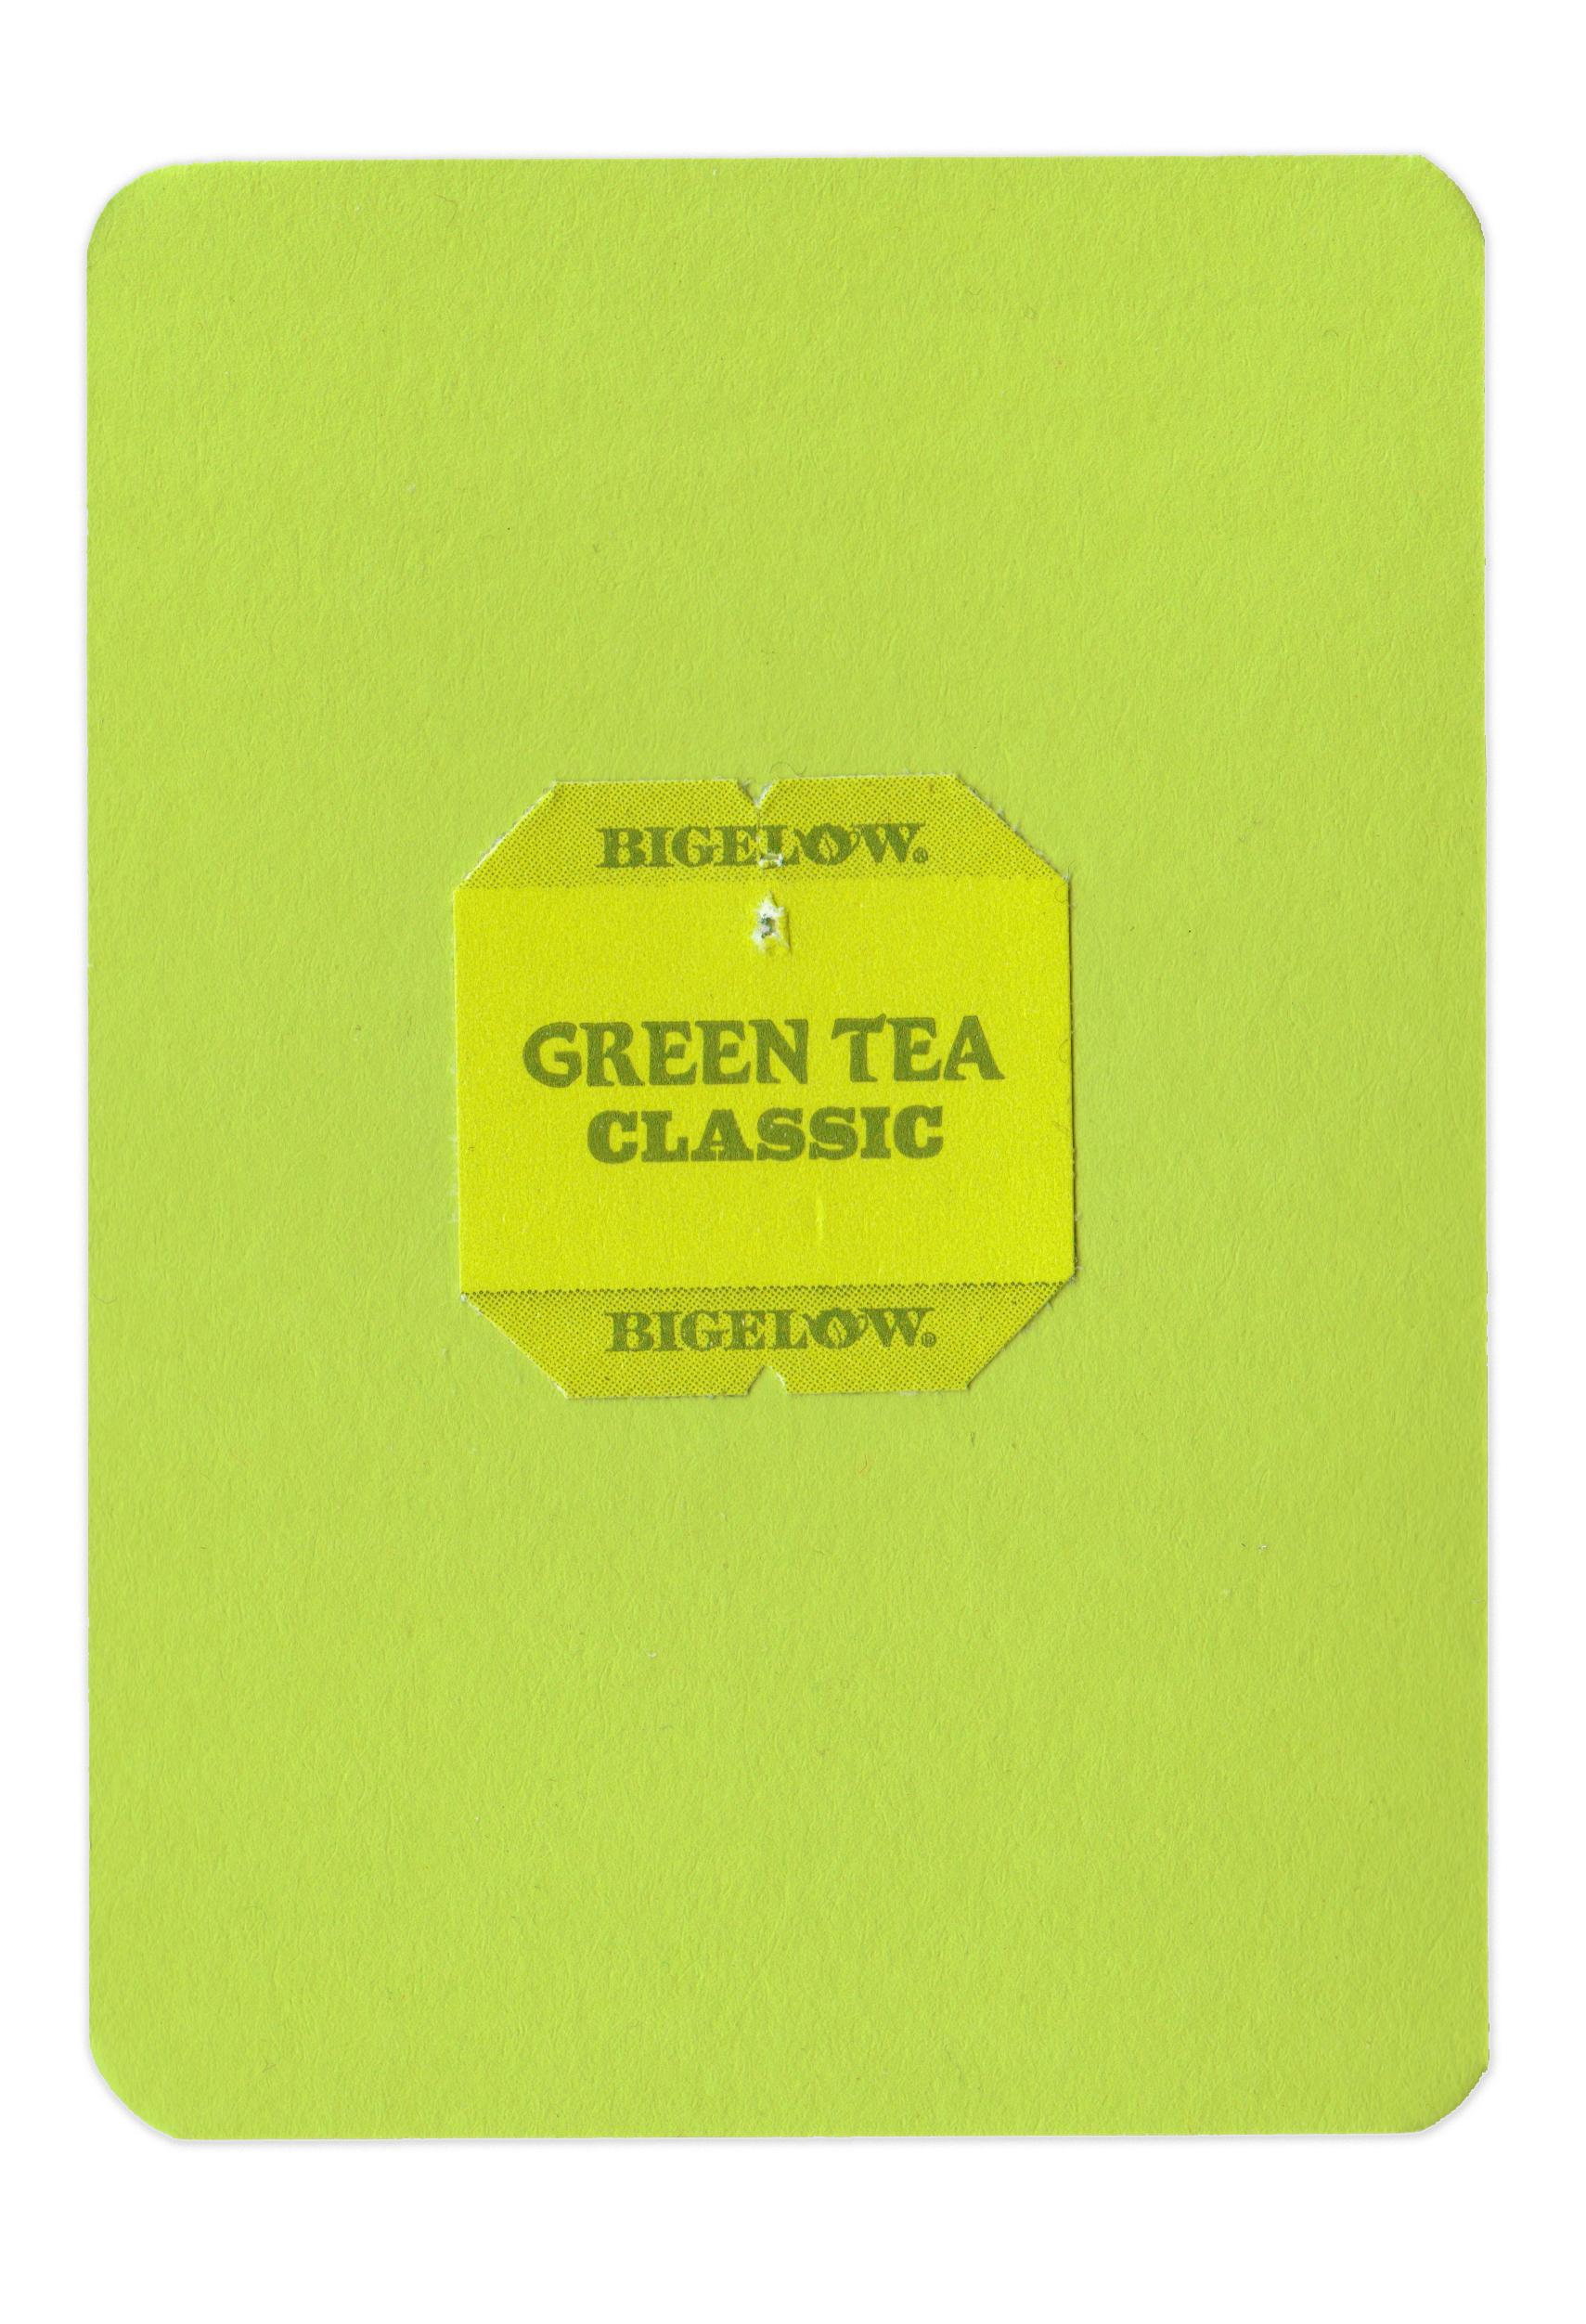 Color_Green_Tea.jpg